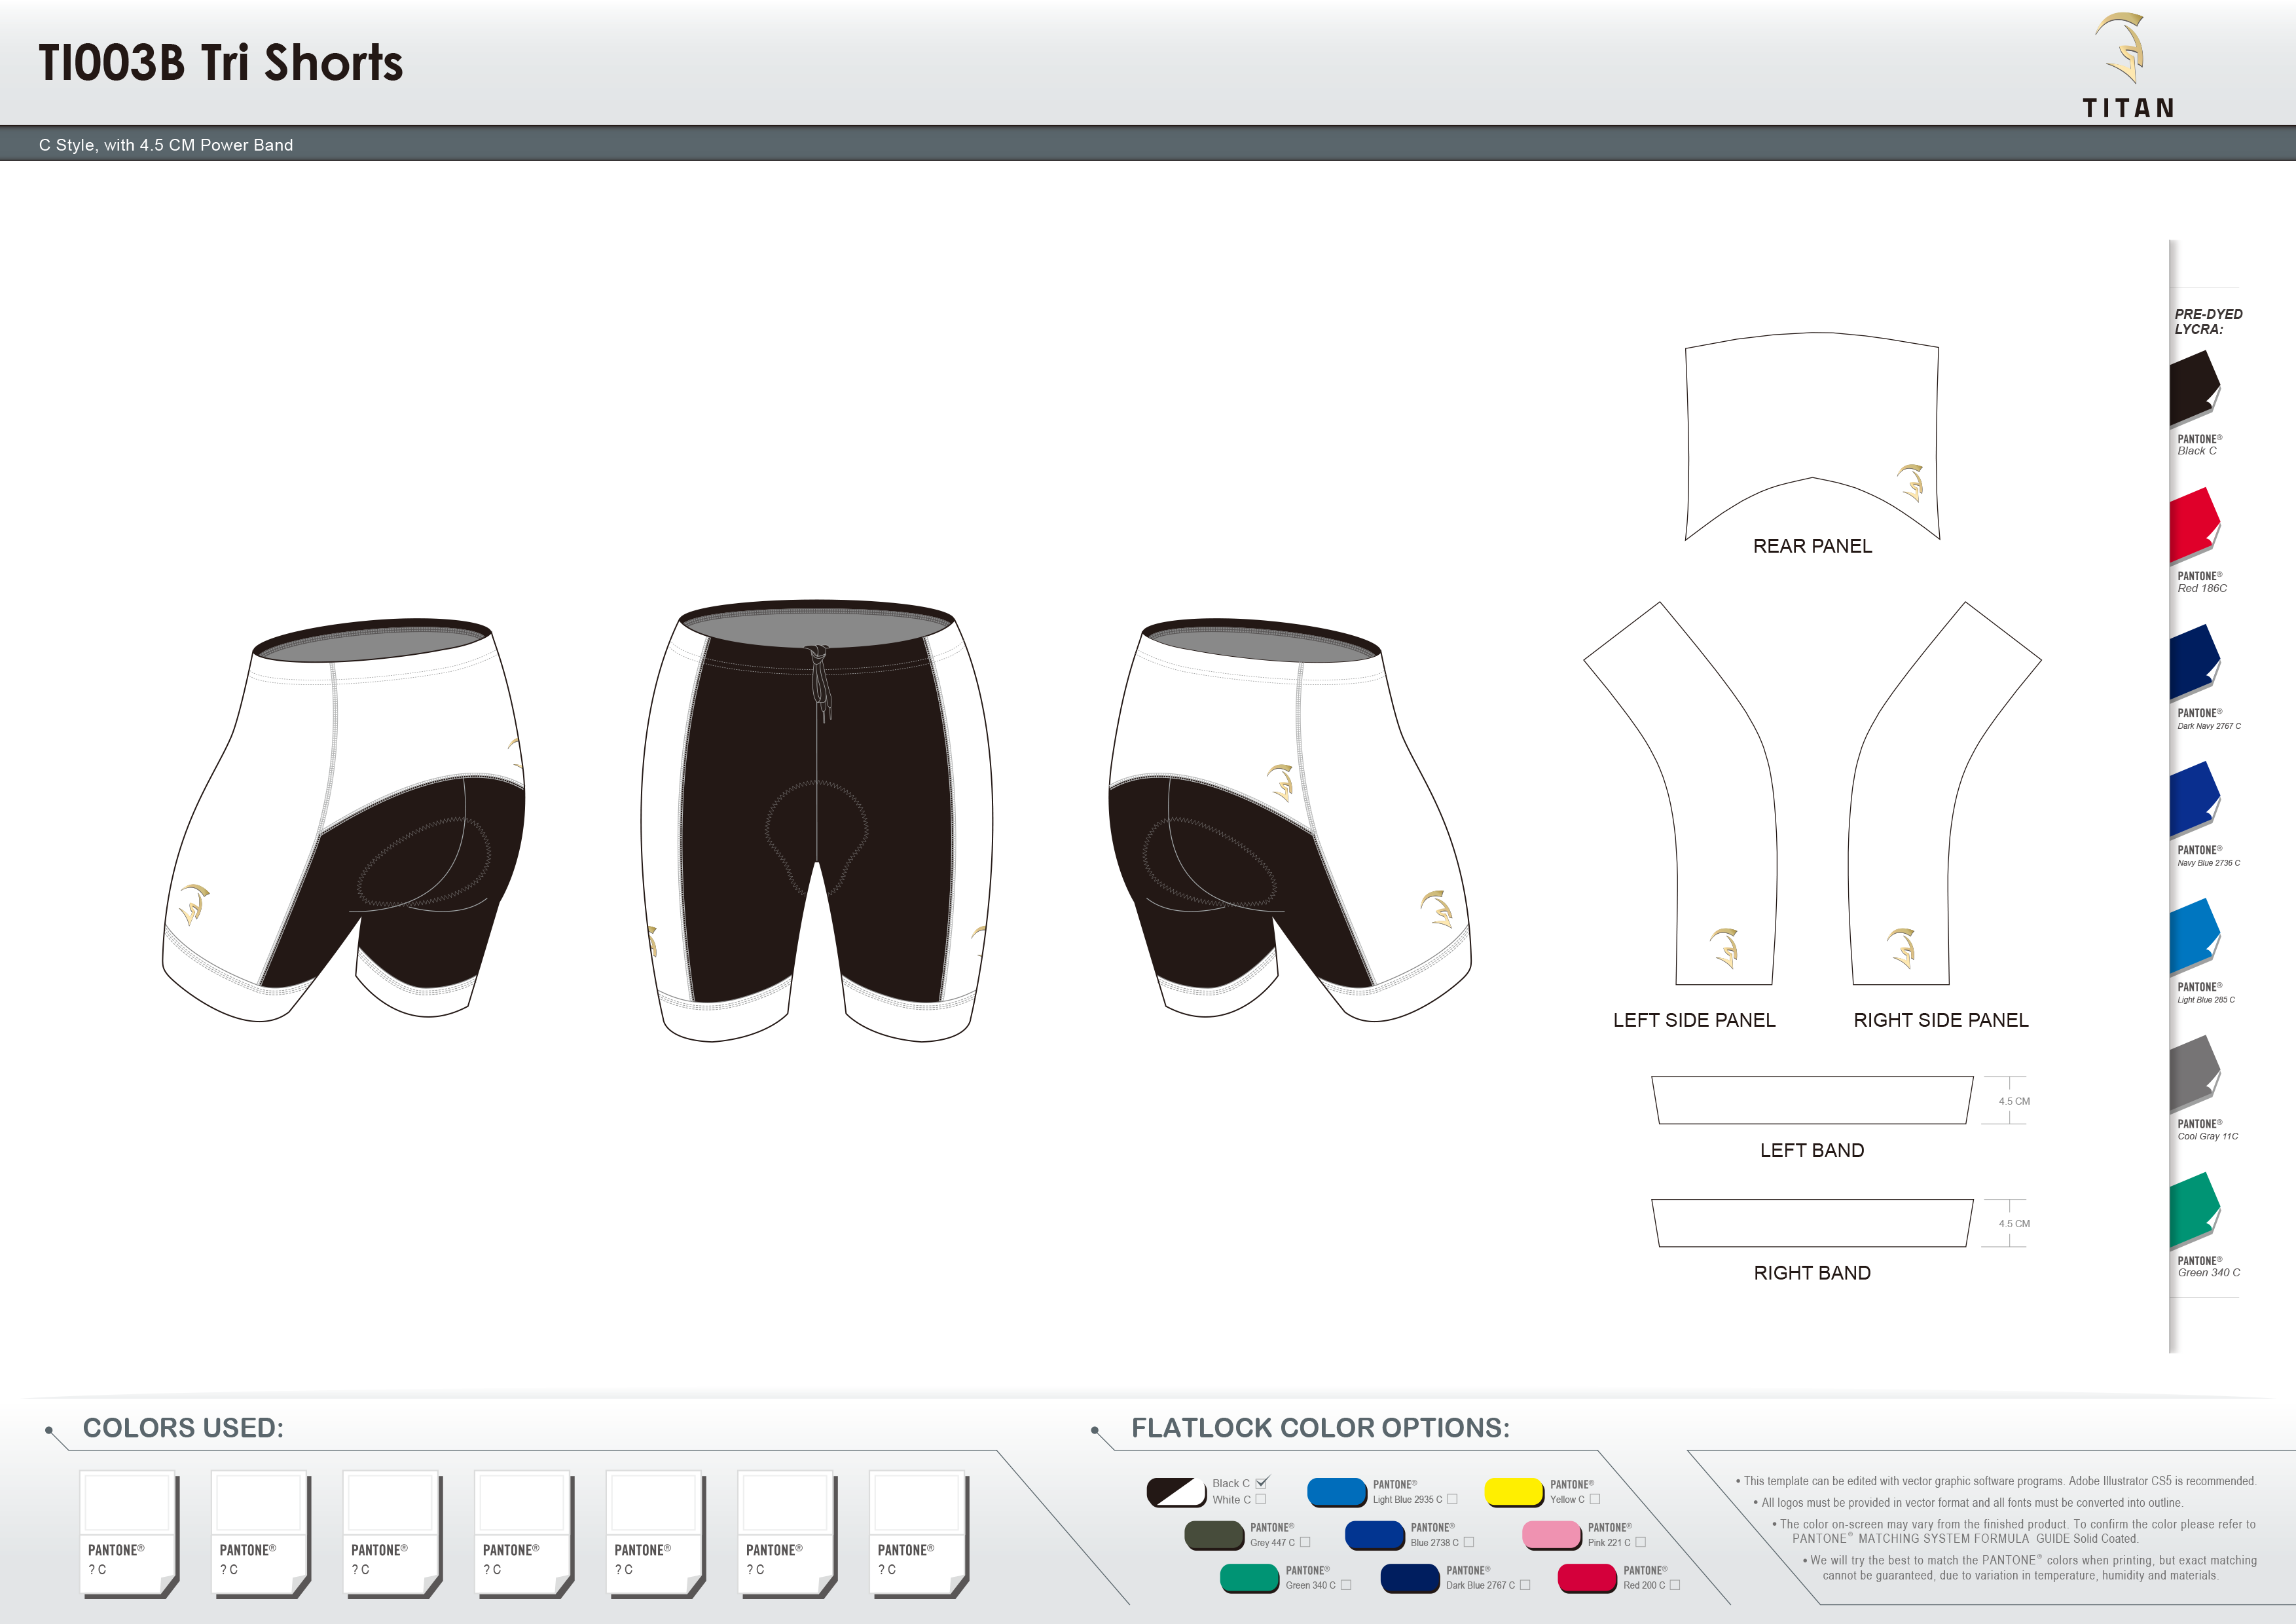 TI003B Tri Shorts